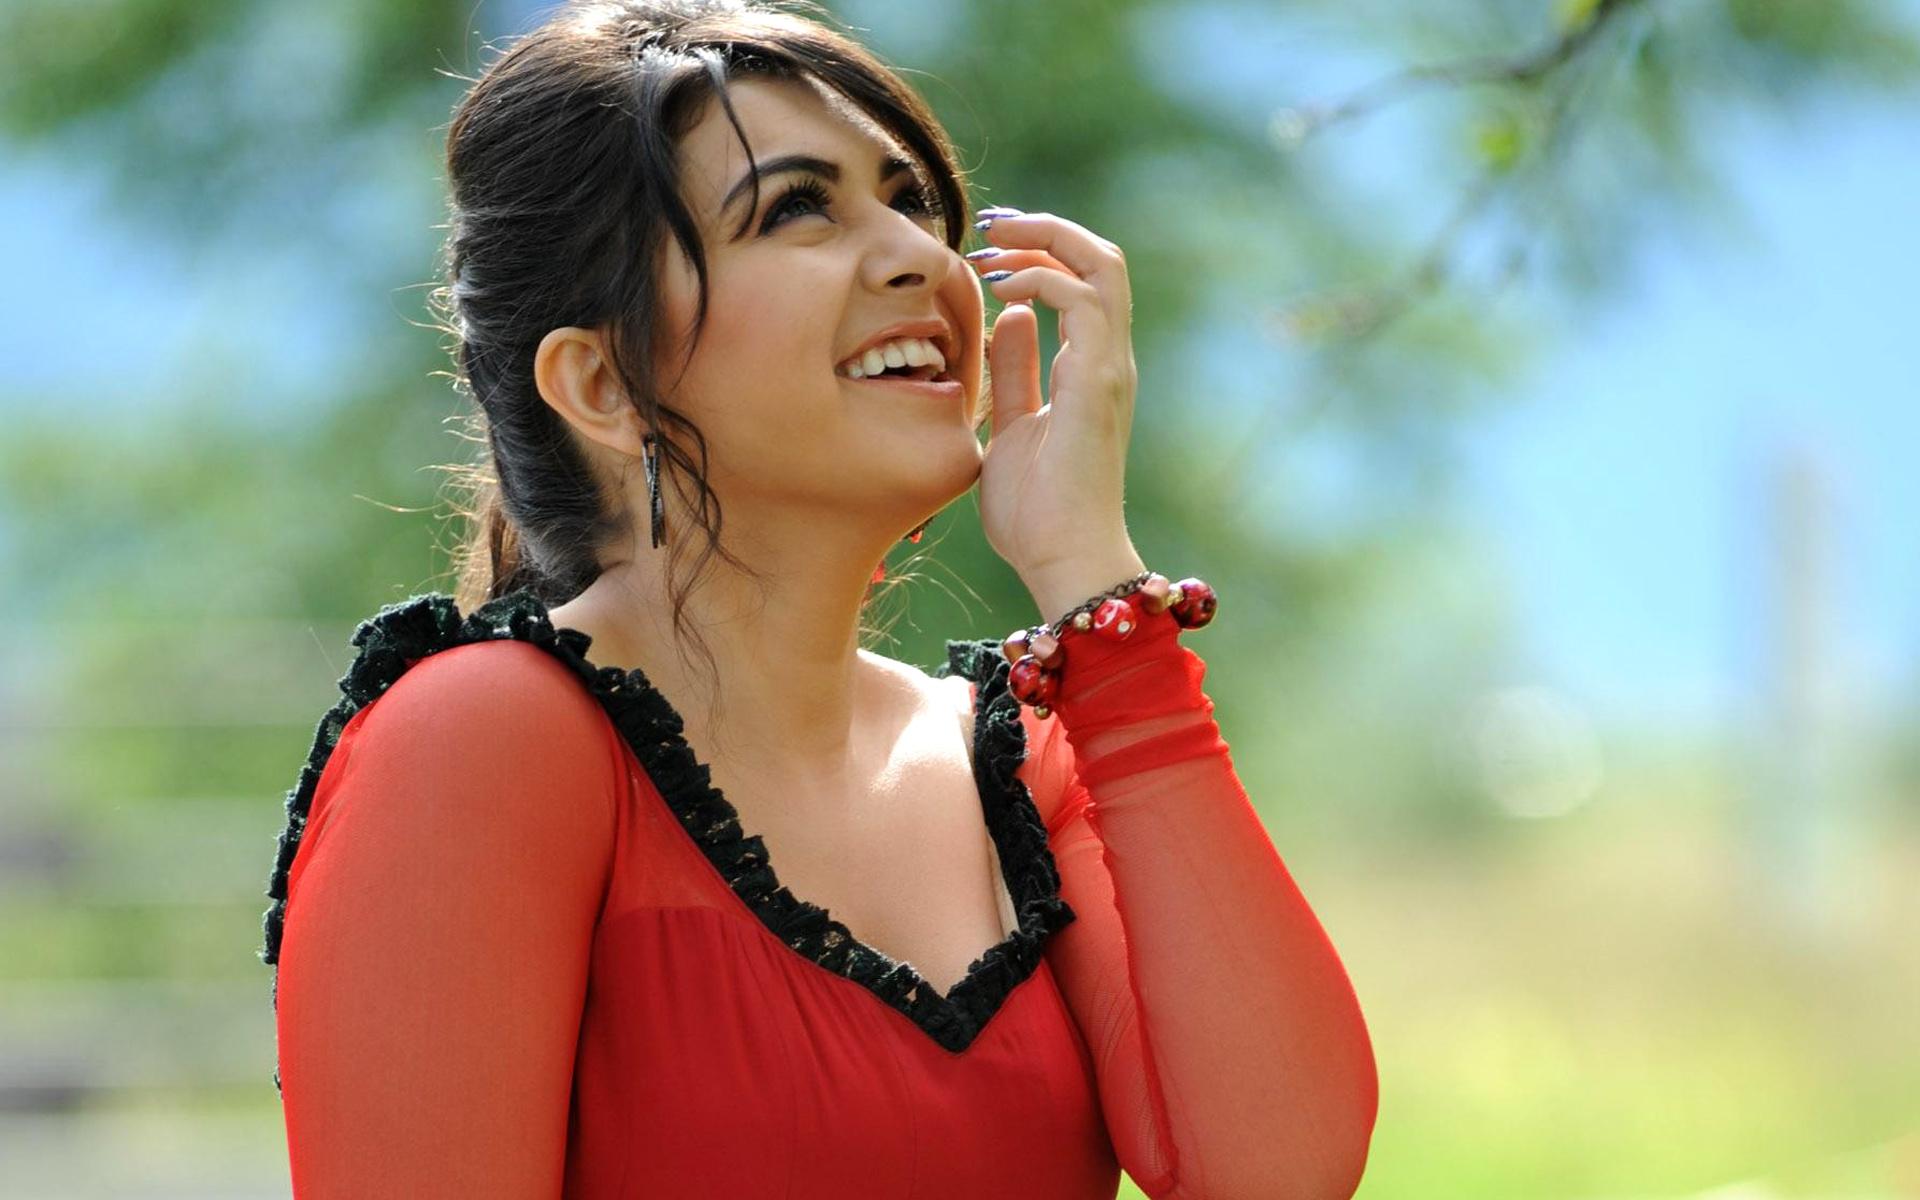 Puli Hansika Motwanis Look from the Vijay Starrer Revealed